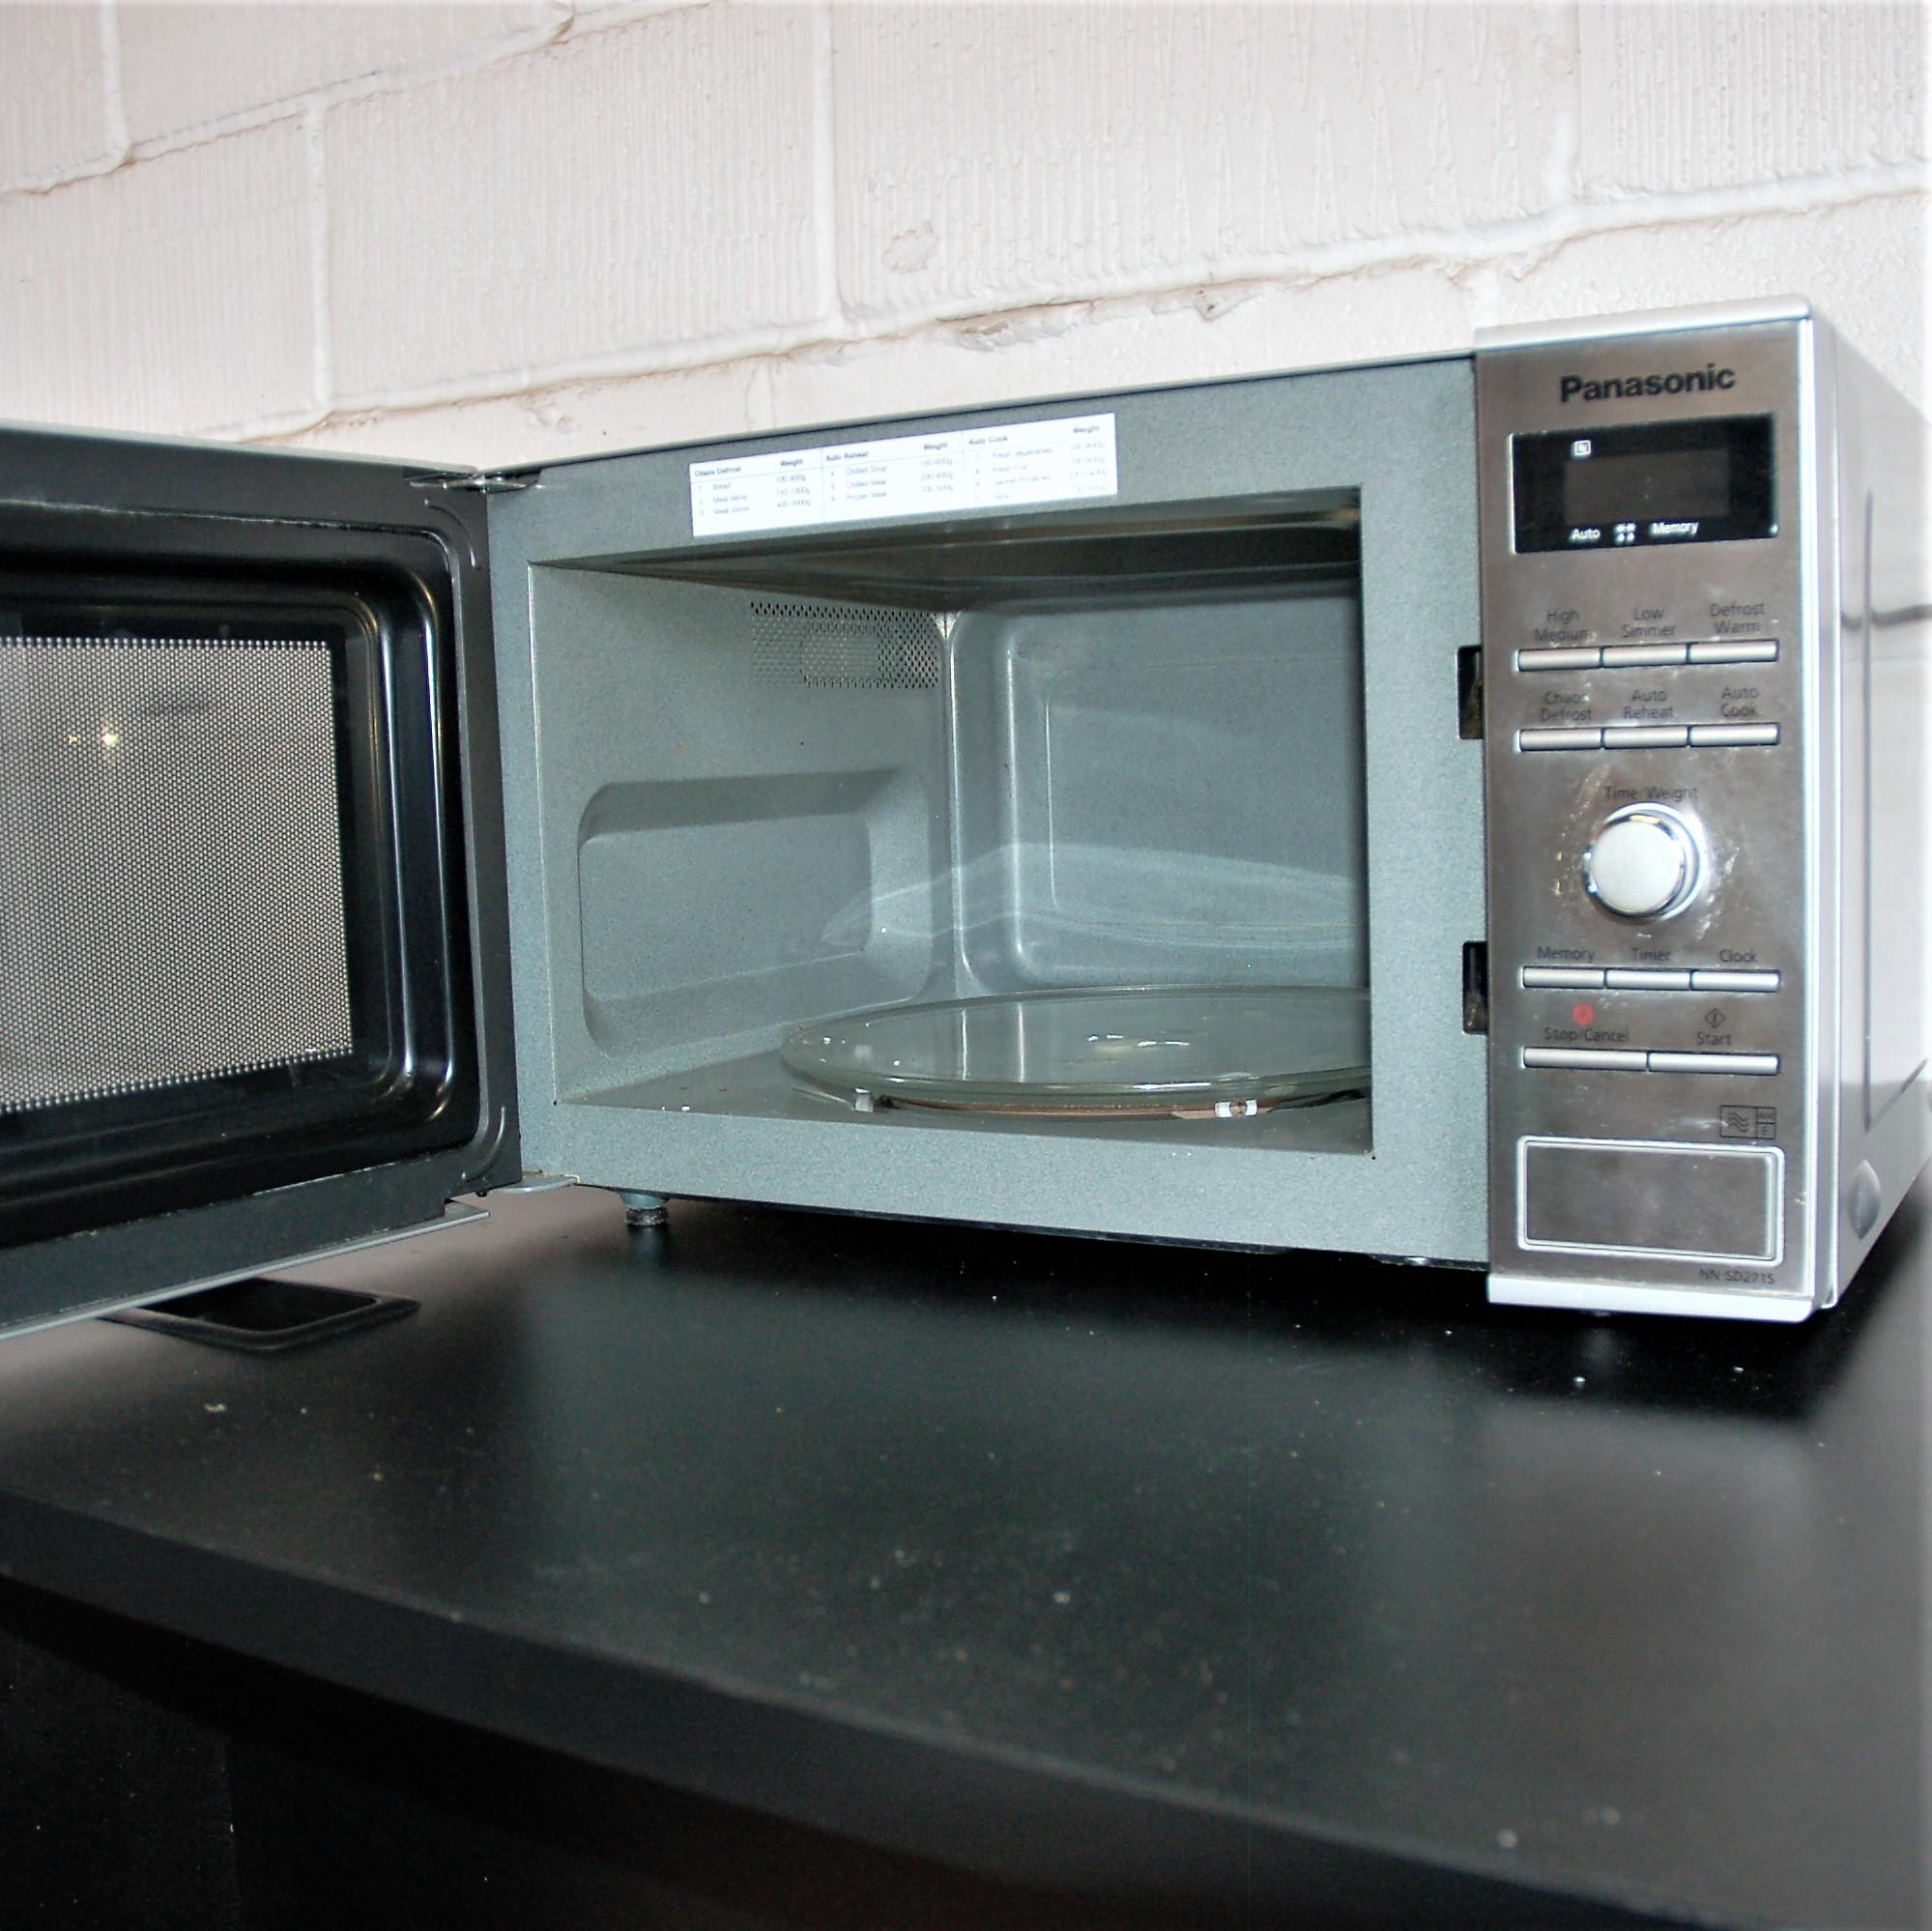 PANASONIC Microwave Oven NN-SD271S Stainless Steel 9047